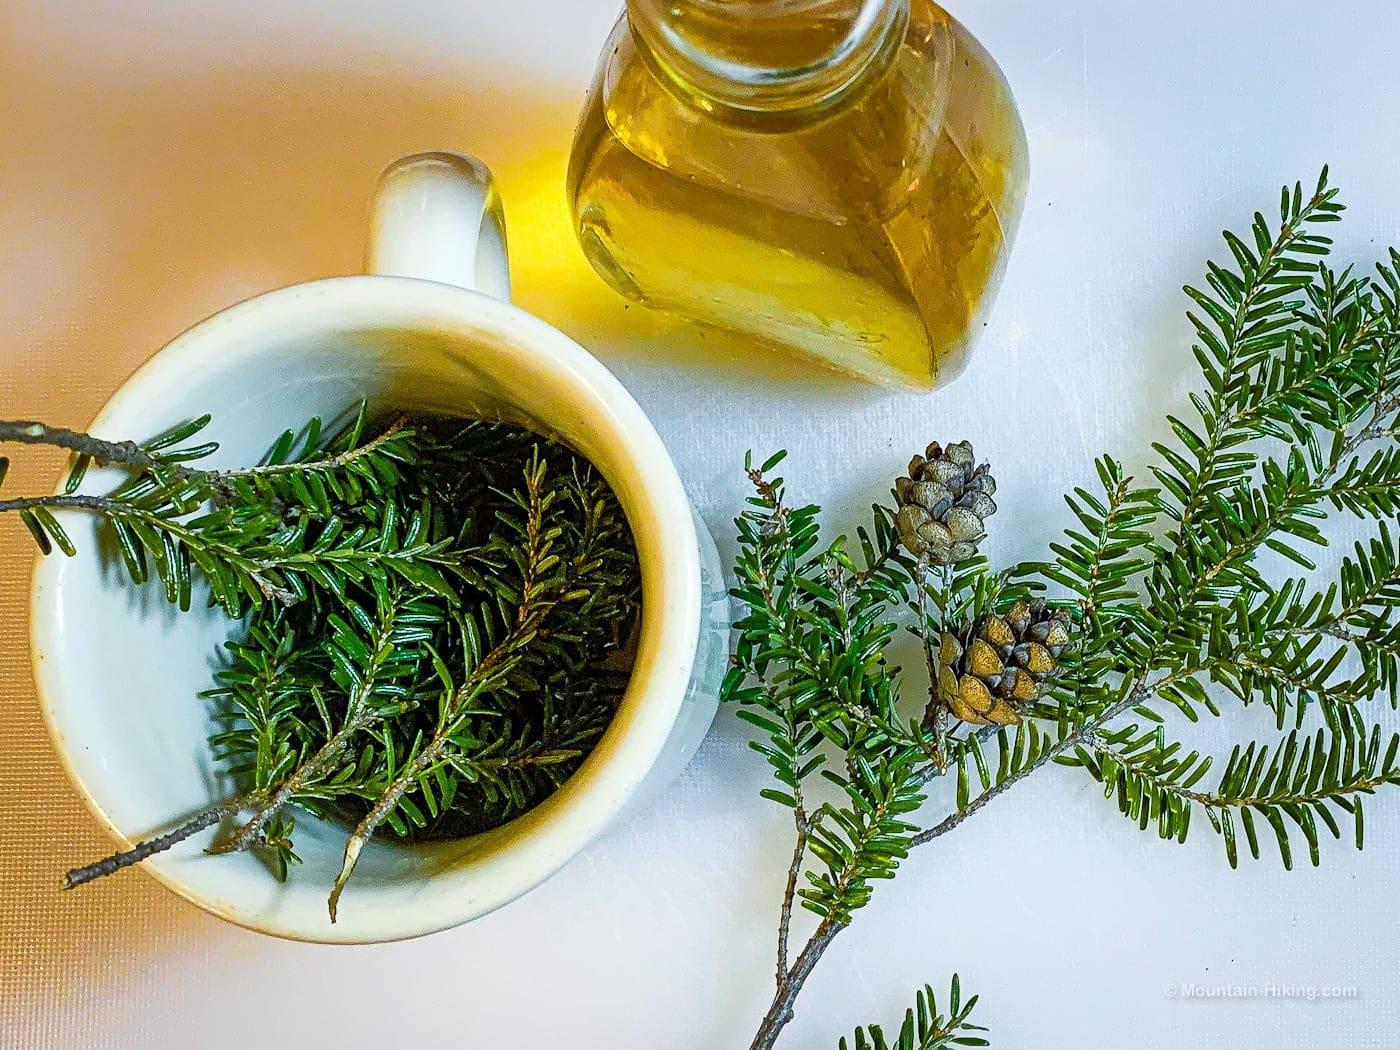 preparing to brew pine needle tea: hemlock twigs in ceramic mug